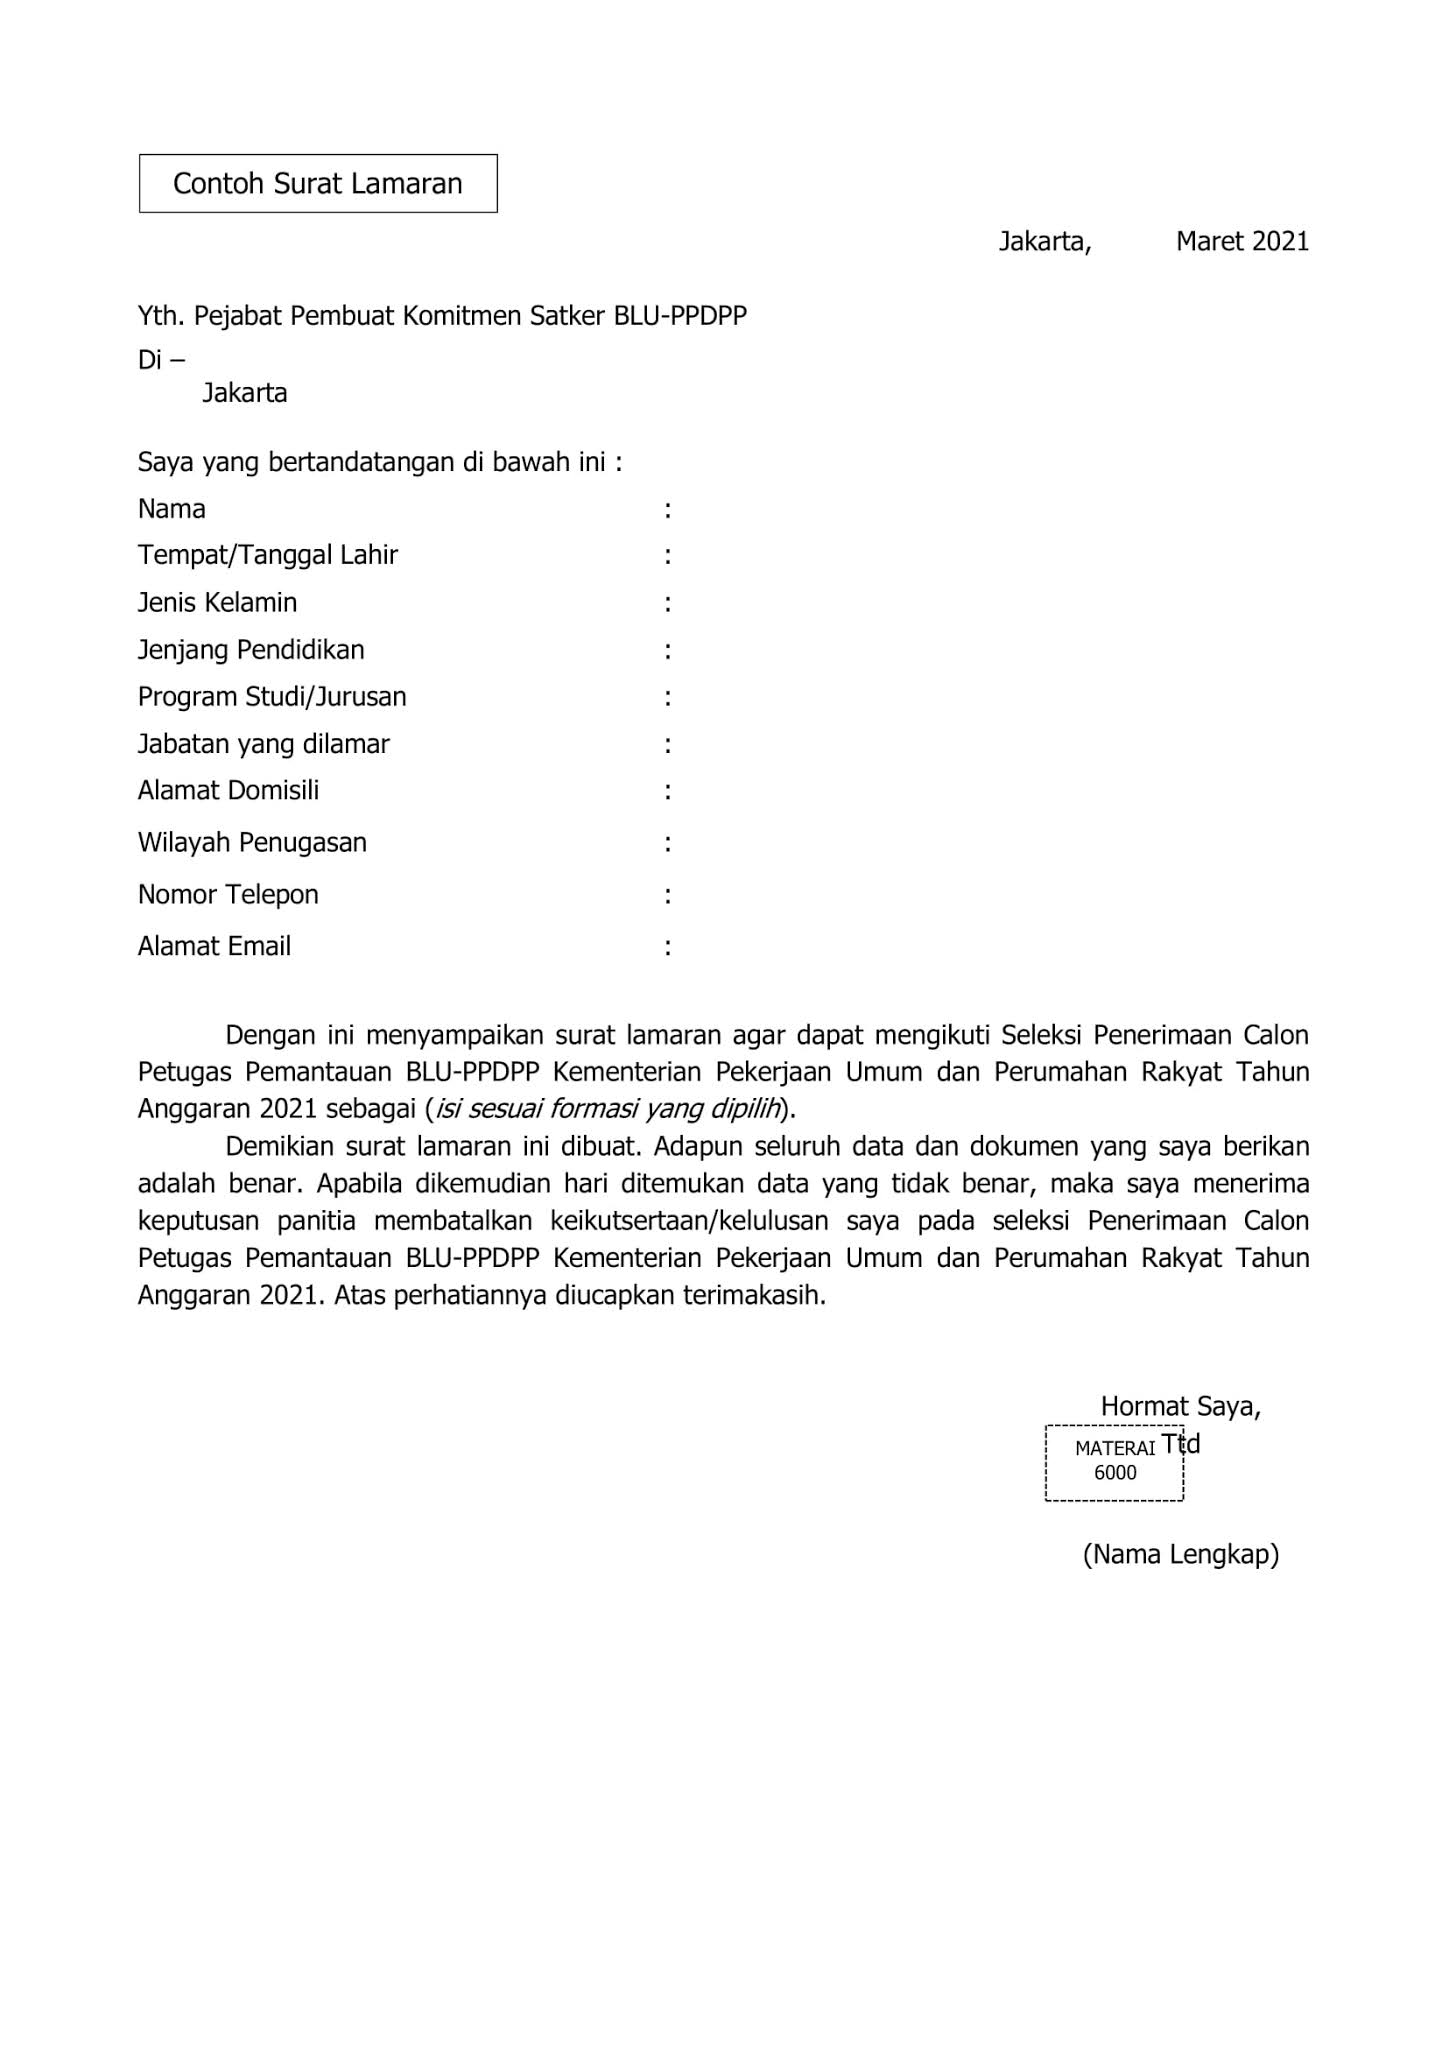 PPDPP Kementerian Pekerjaan Umum dan Perumahan Rakyat Tingkat SMA SMK D3 Maret 2021